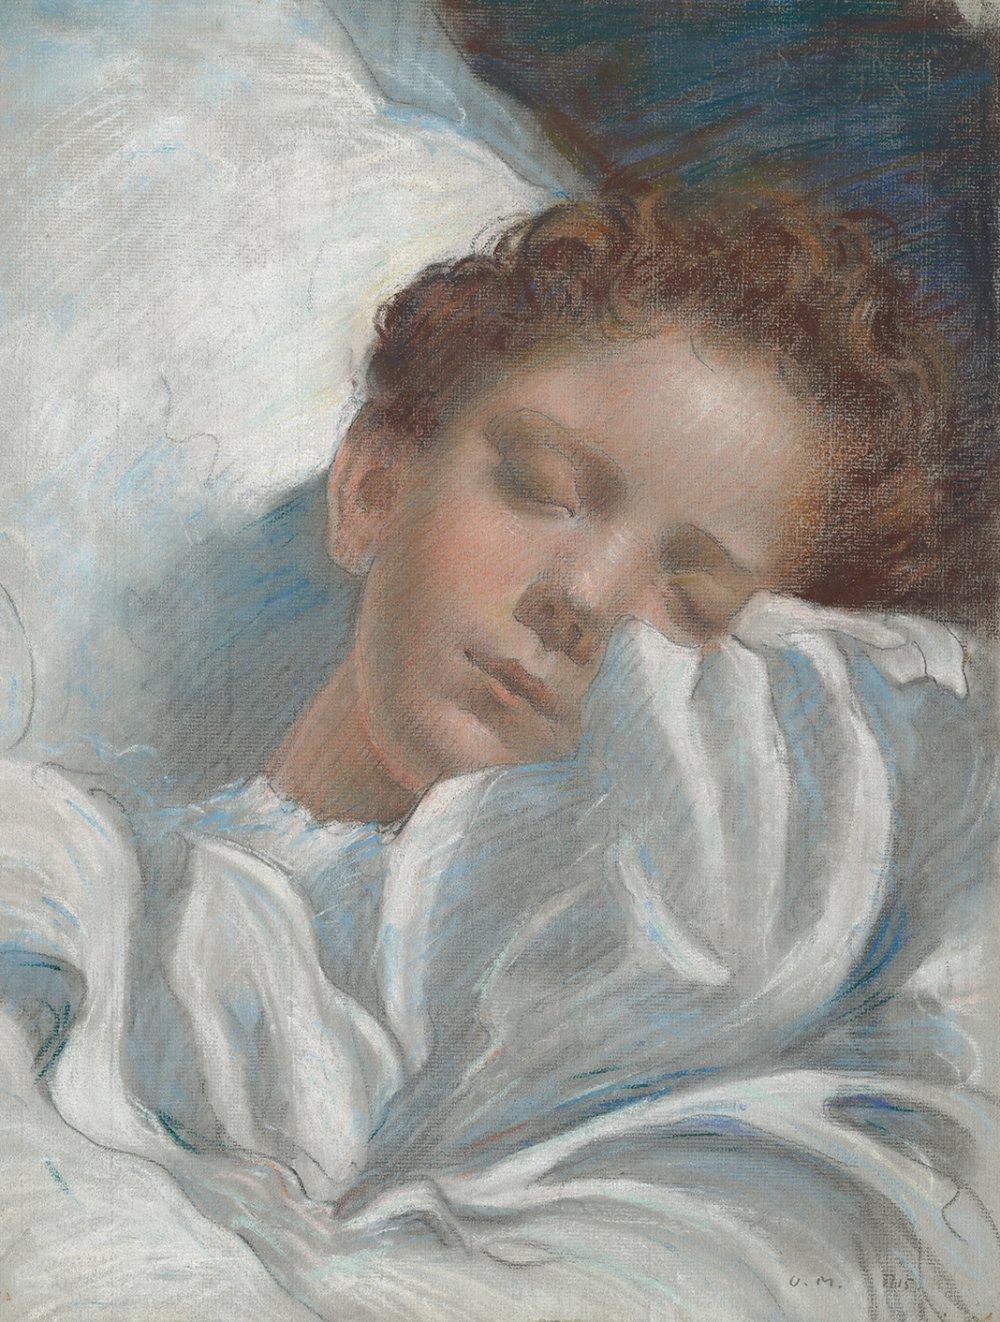 Study of a Sleeping Child